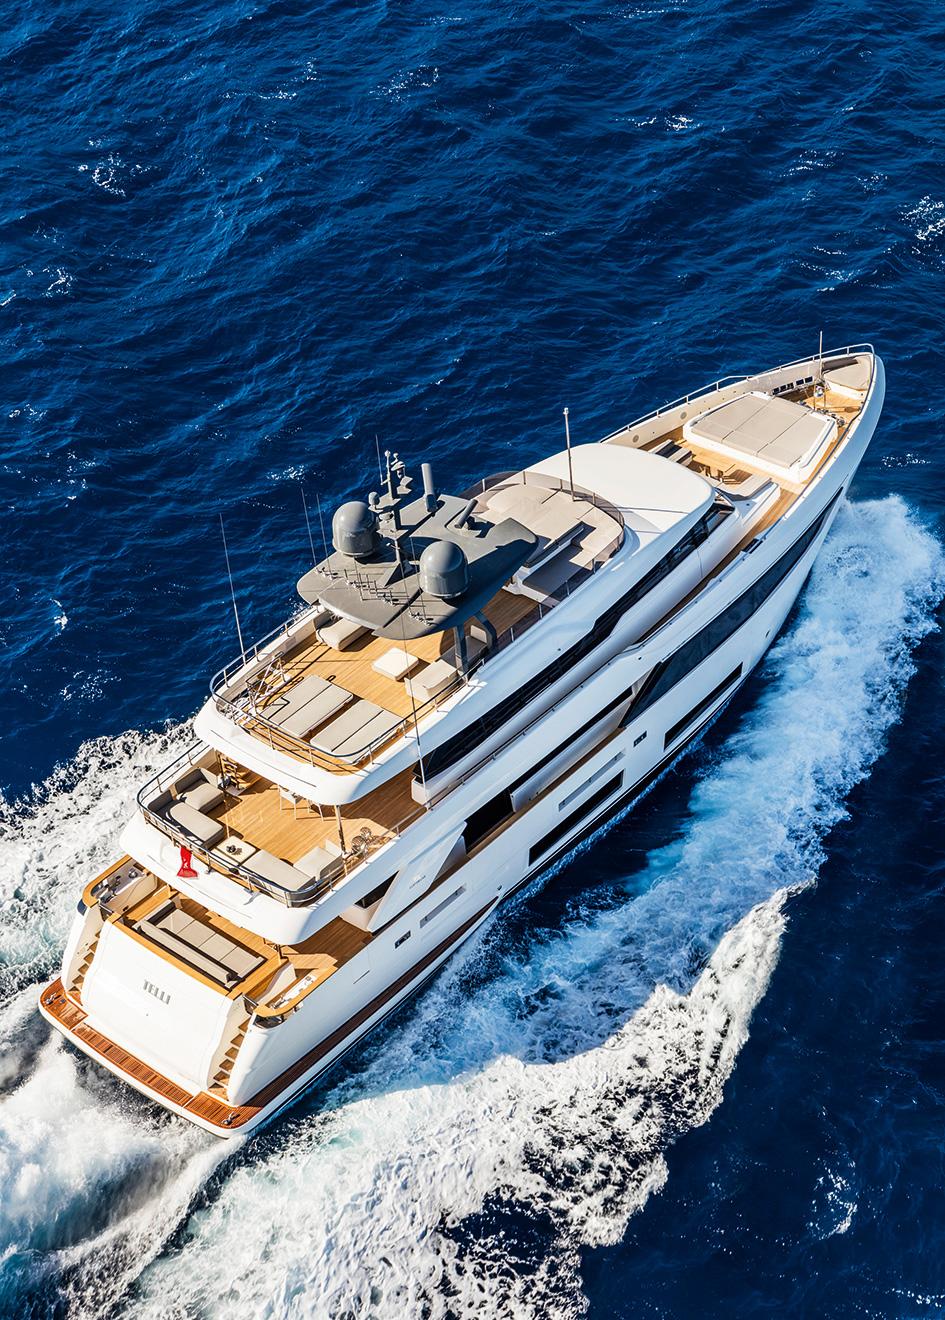 aerial-view-of-the-ferretti-custom-line-motor-yacht-telli-credit-maurizio-paradisi